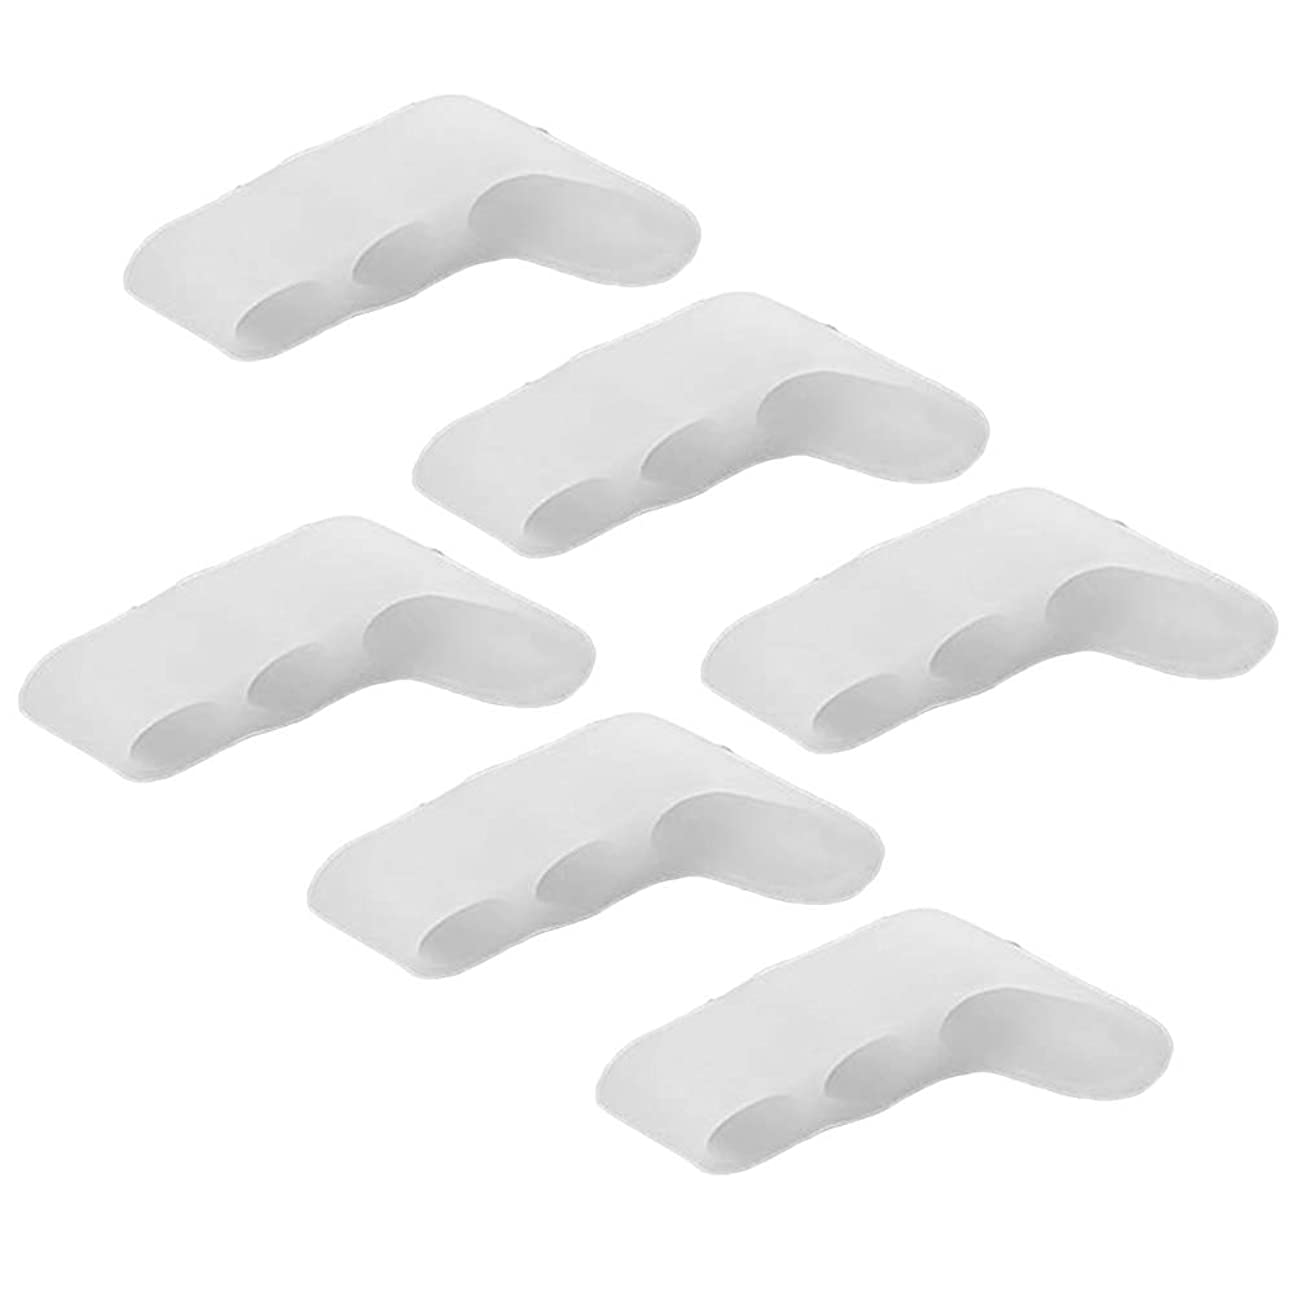 Healifty 足指姿勢補正 バニオンプロテクター 補正器 トゥセパレーター スプレッダー パッド 10本入(ホワイト)